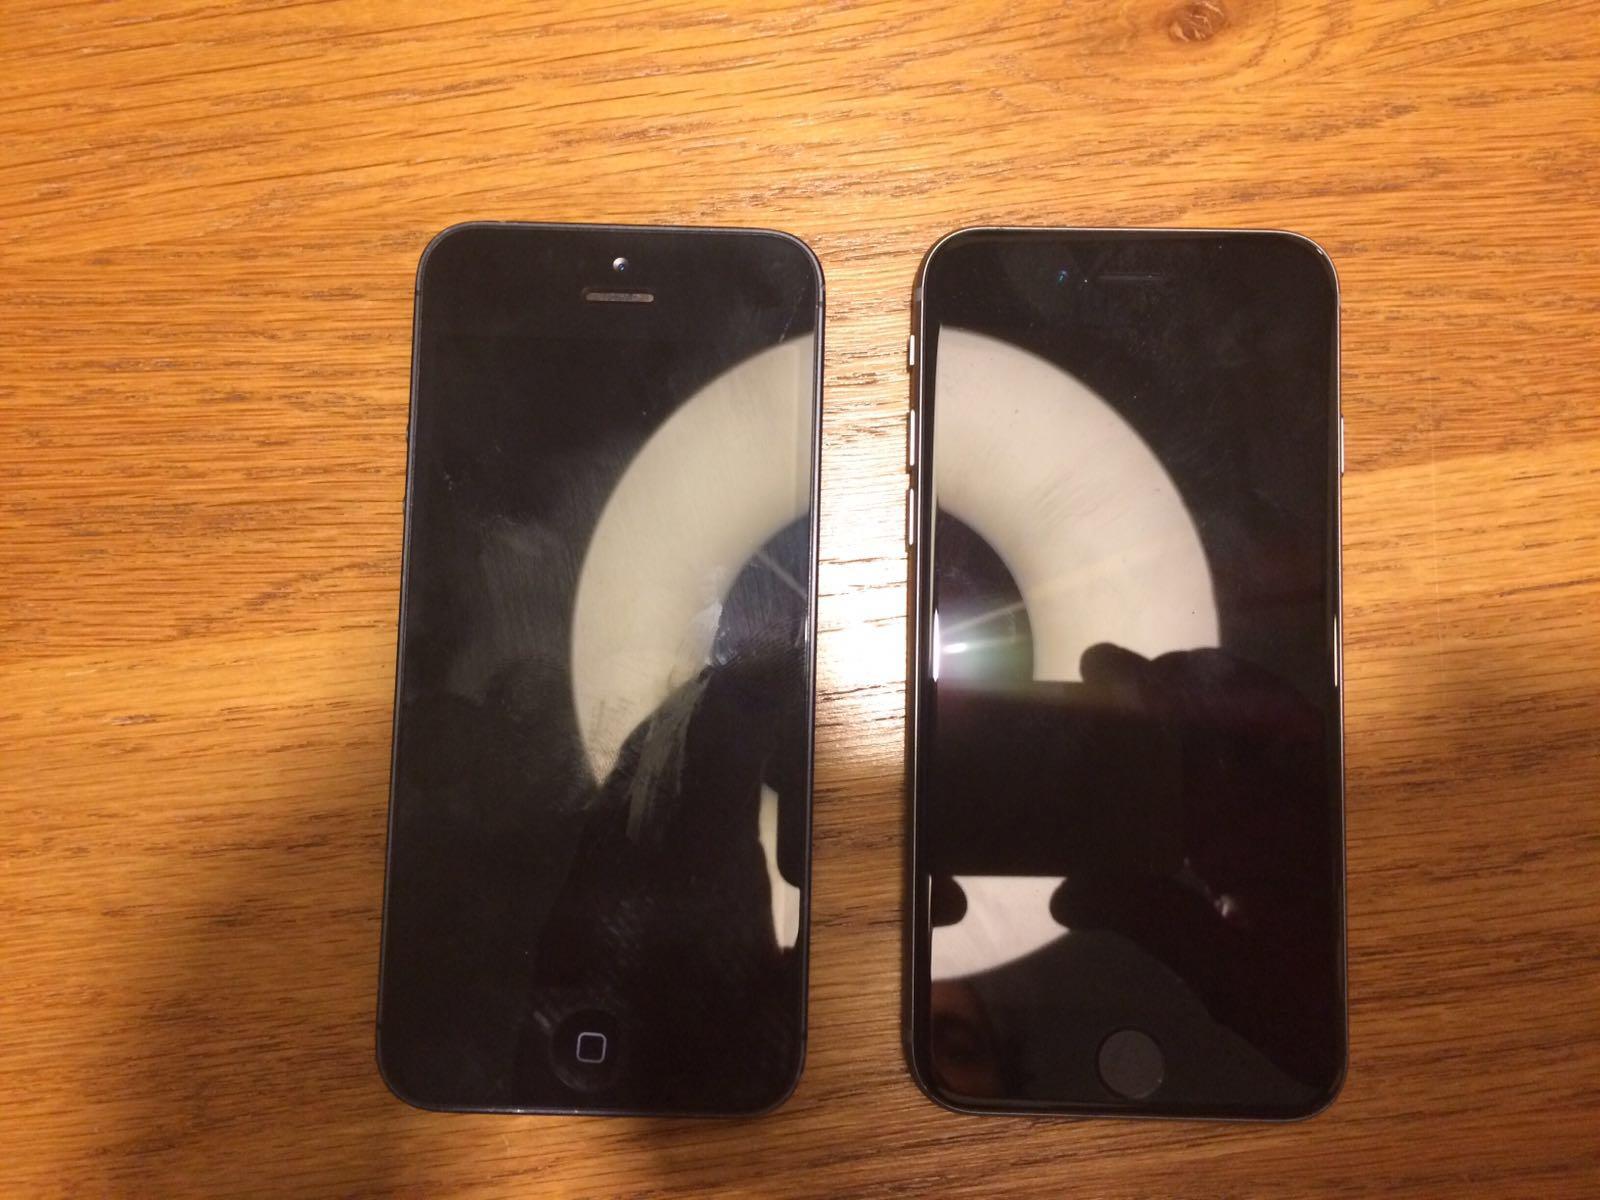 In foto il probabile iPhone 5se: display 4 pollici, ma somiglia ad iPhone 6s